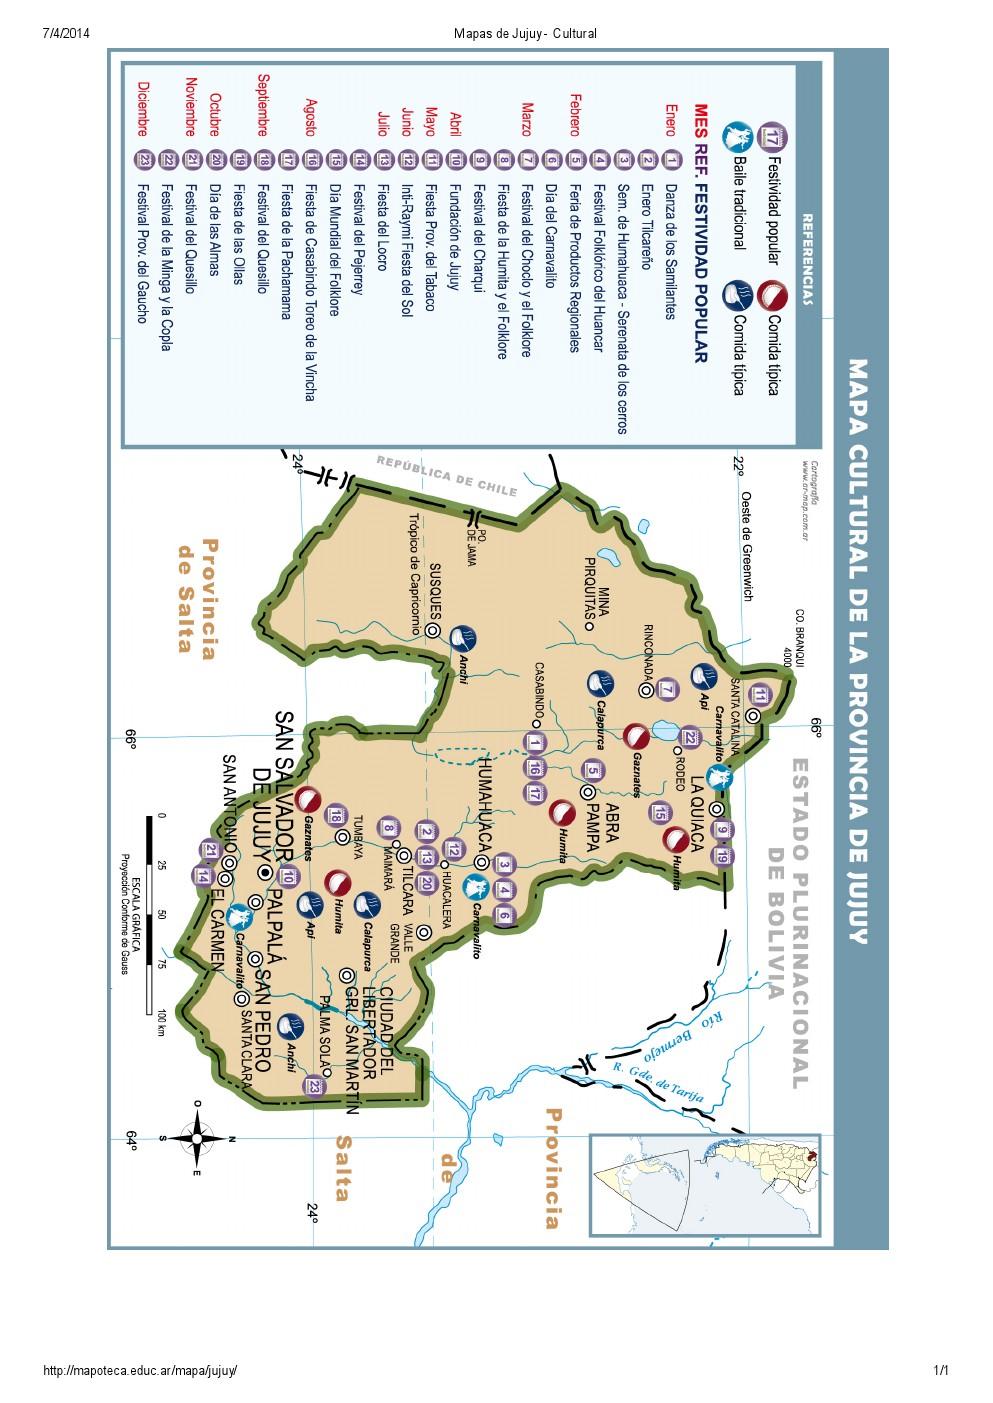 Mapa cultural de Jujuy. Mapoteca de Educ.ar